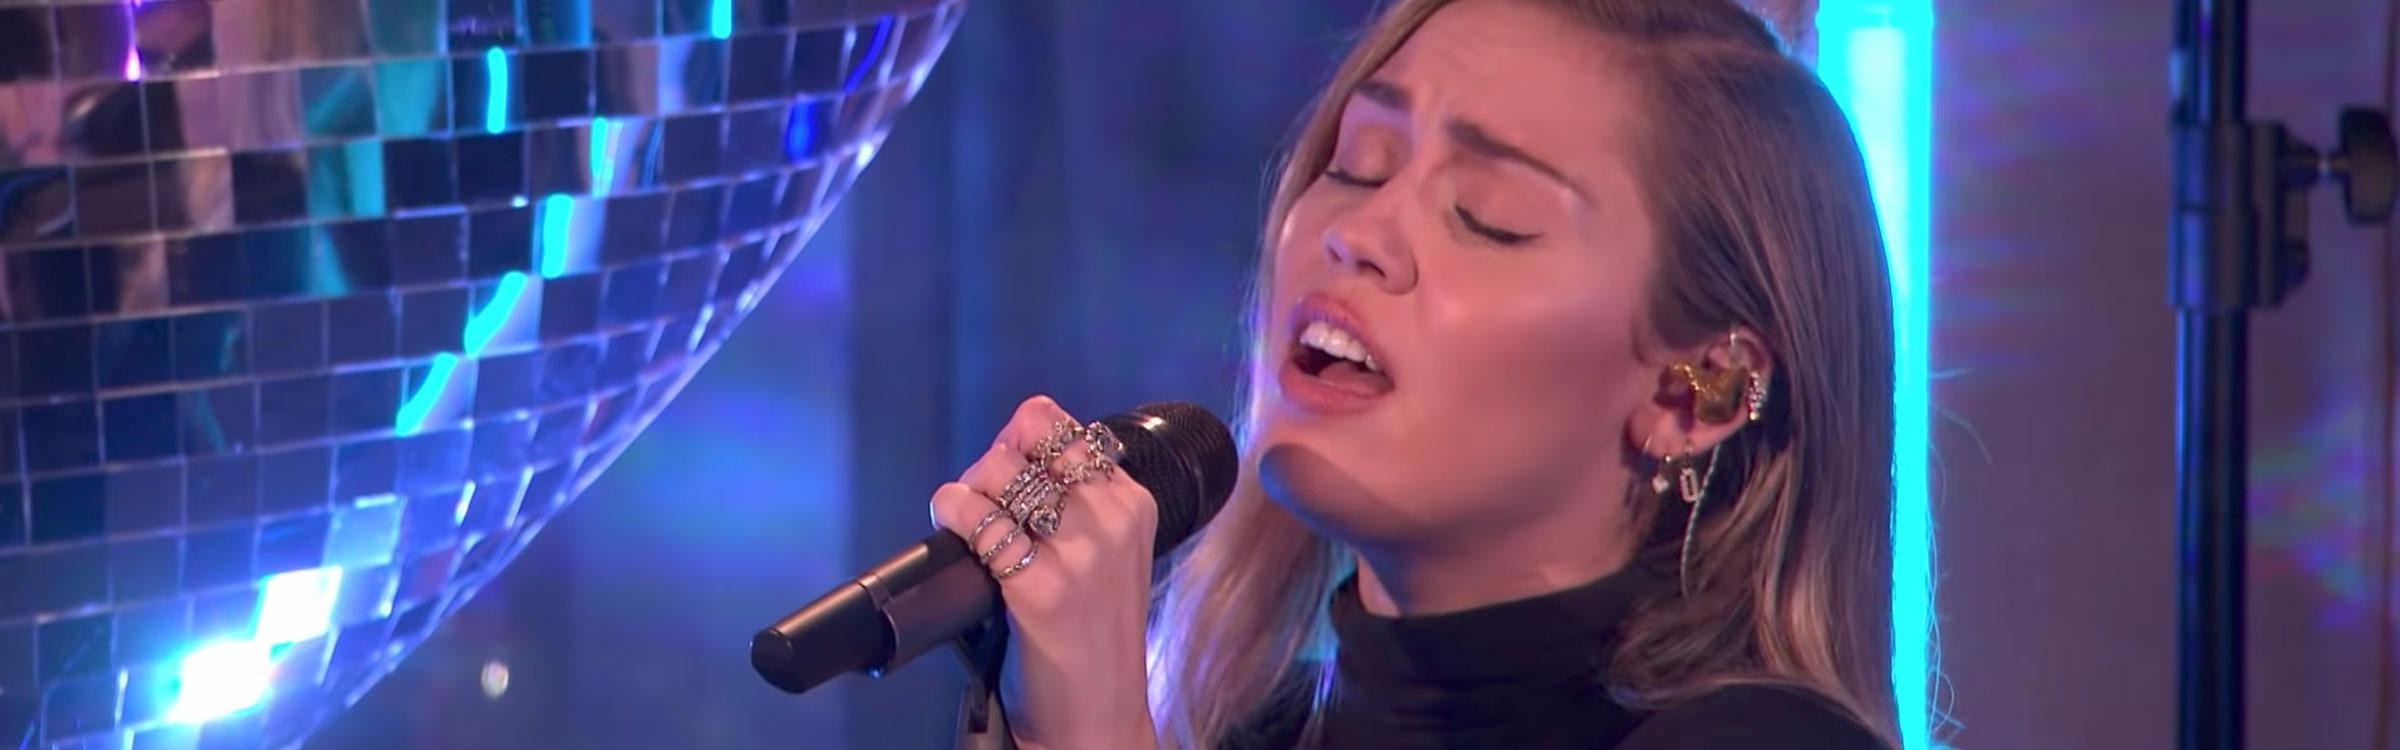 Miley header